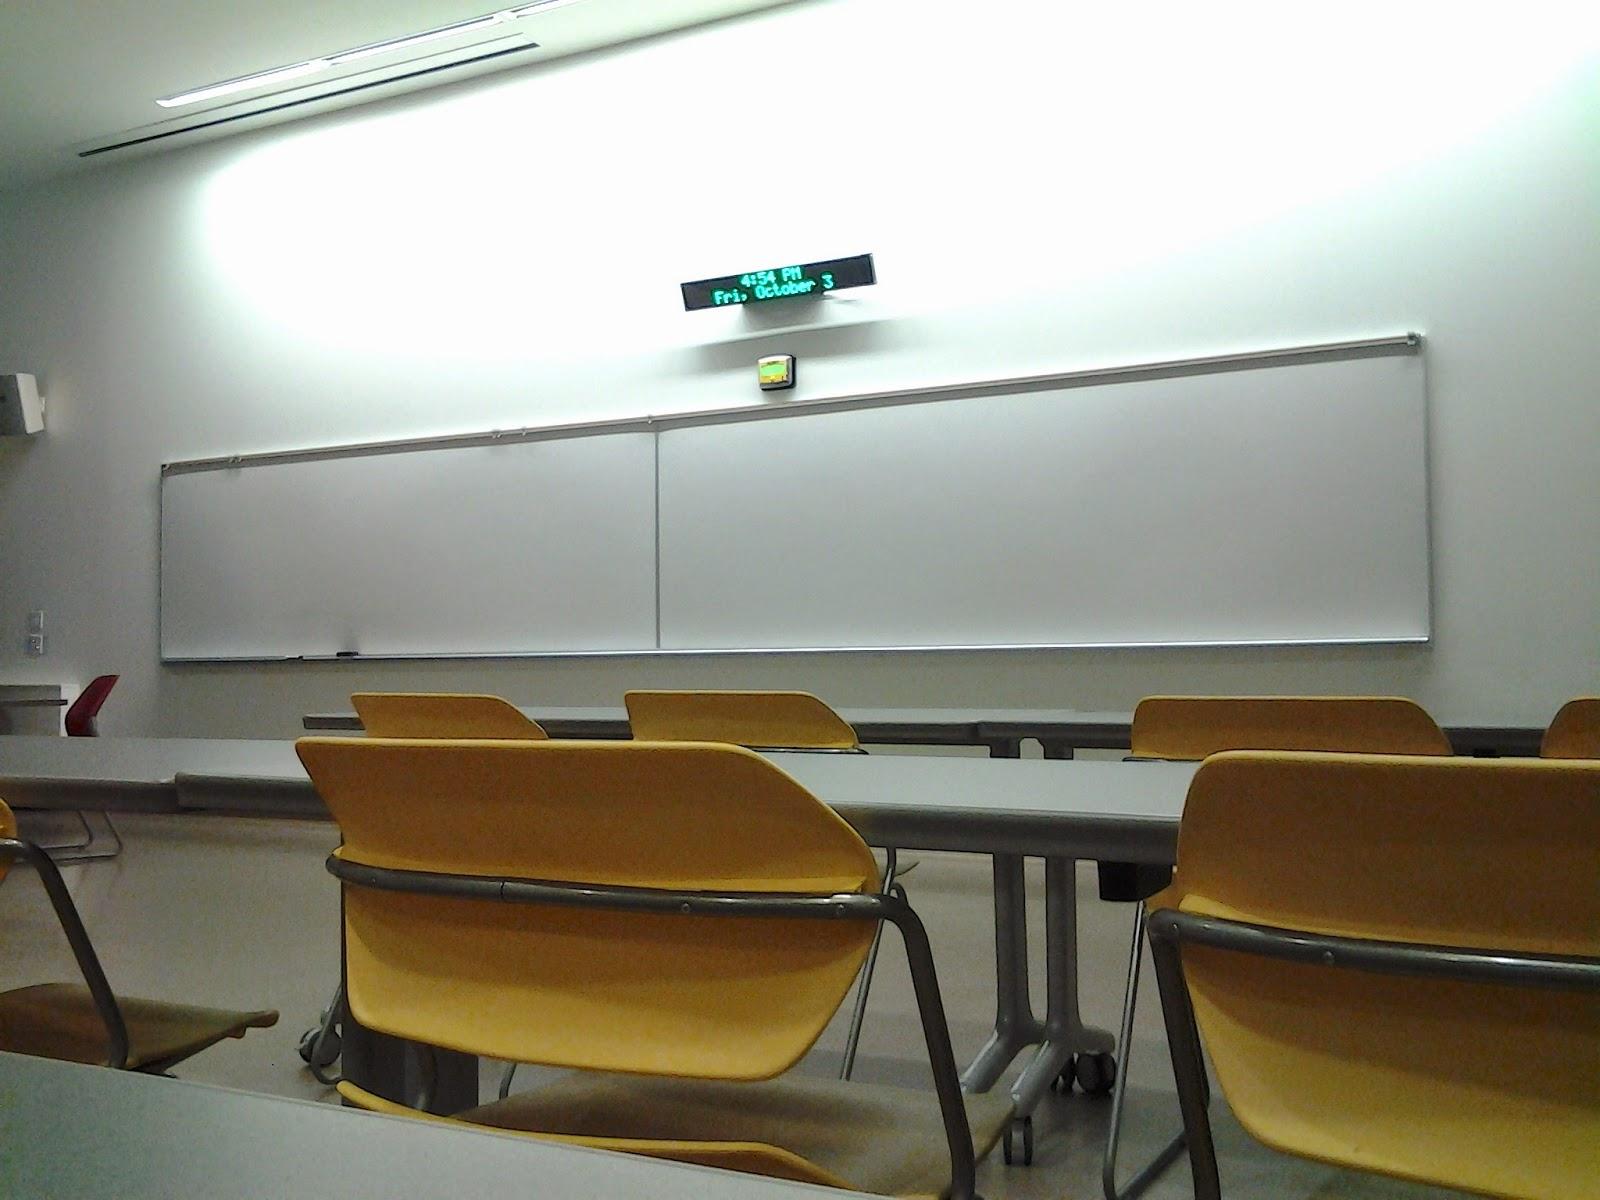 how to study medical school university katz centre alberta